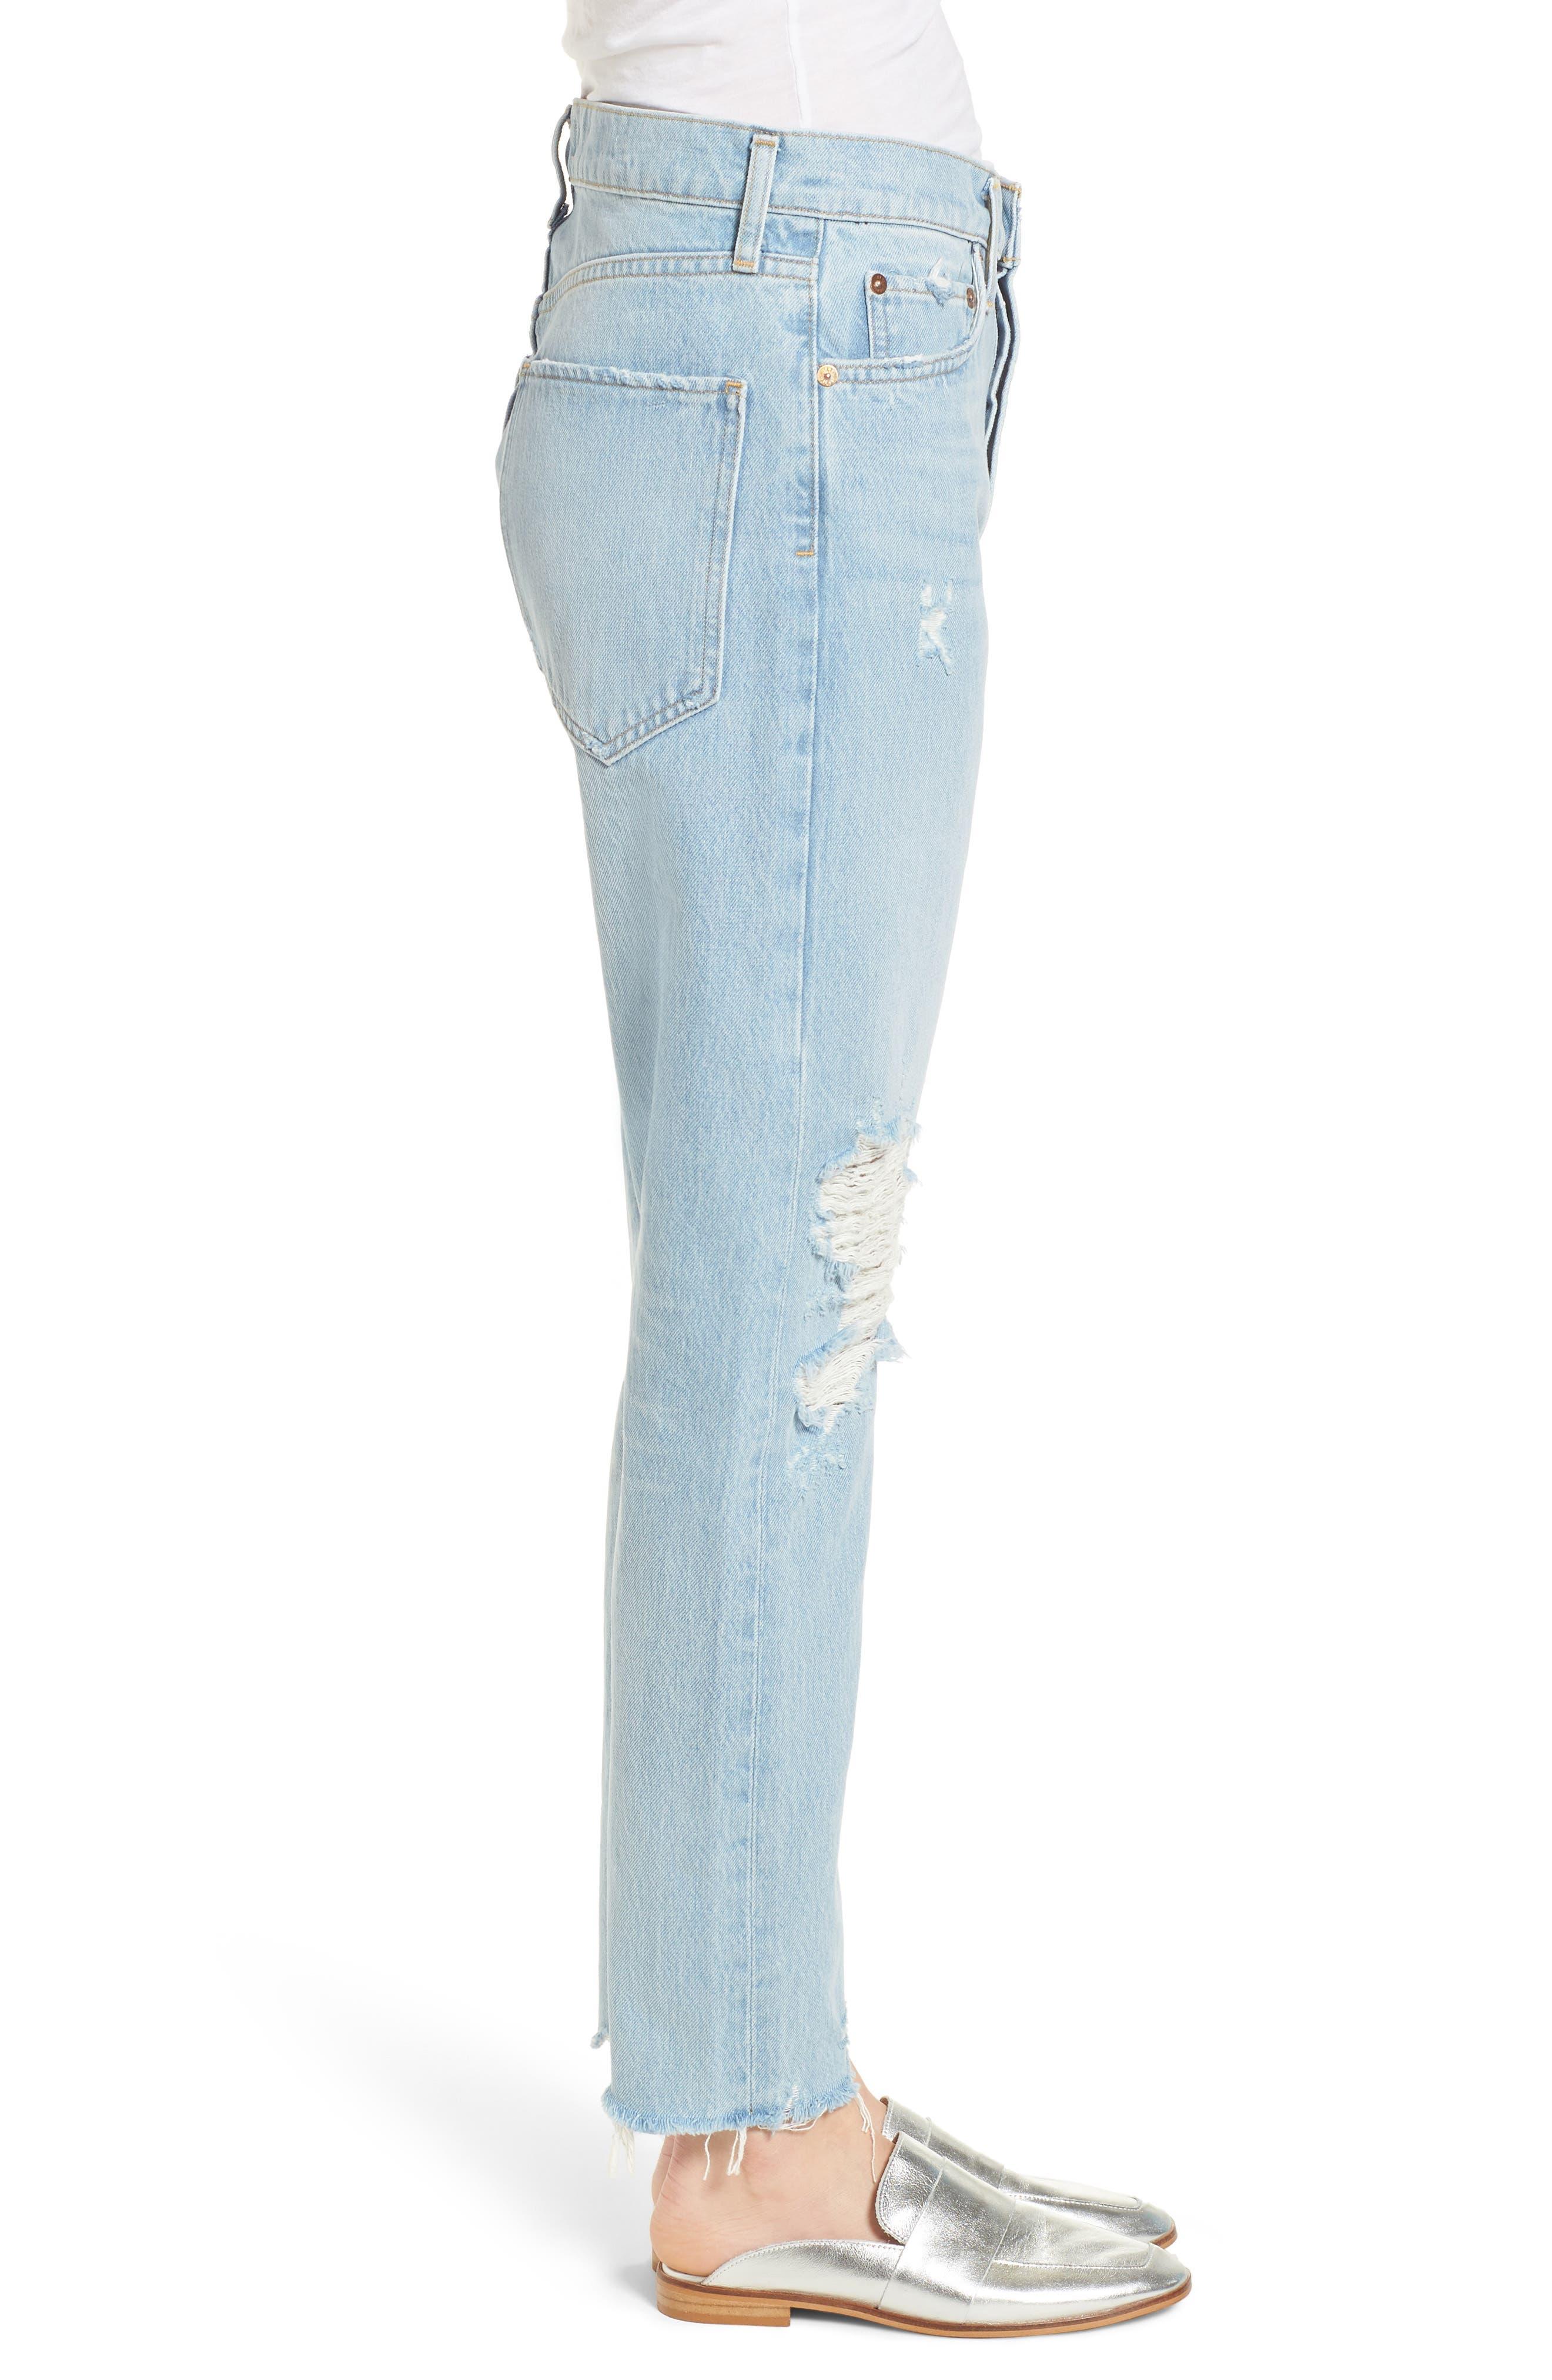 Jamie High Waist Ankle Jeans,                             Alternate thumbnail 3, color,                             453